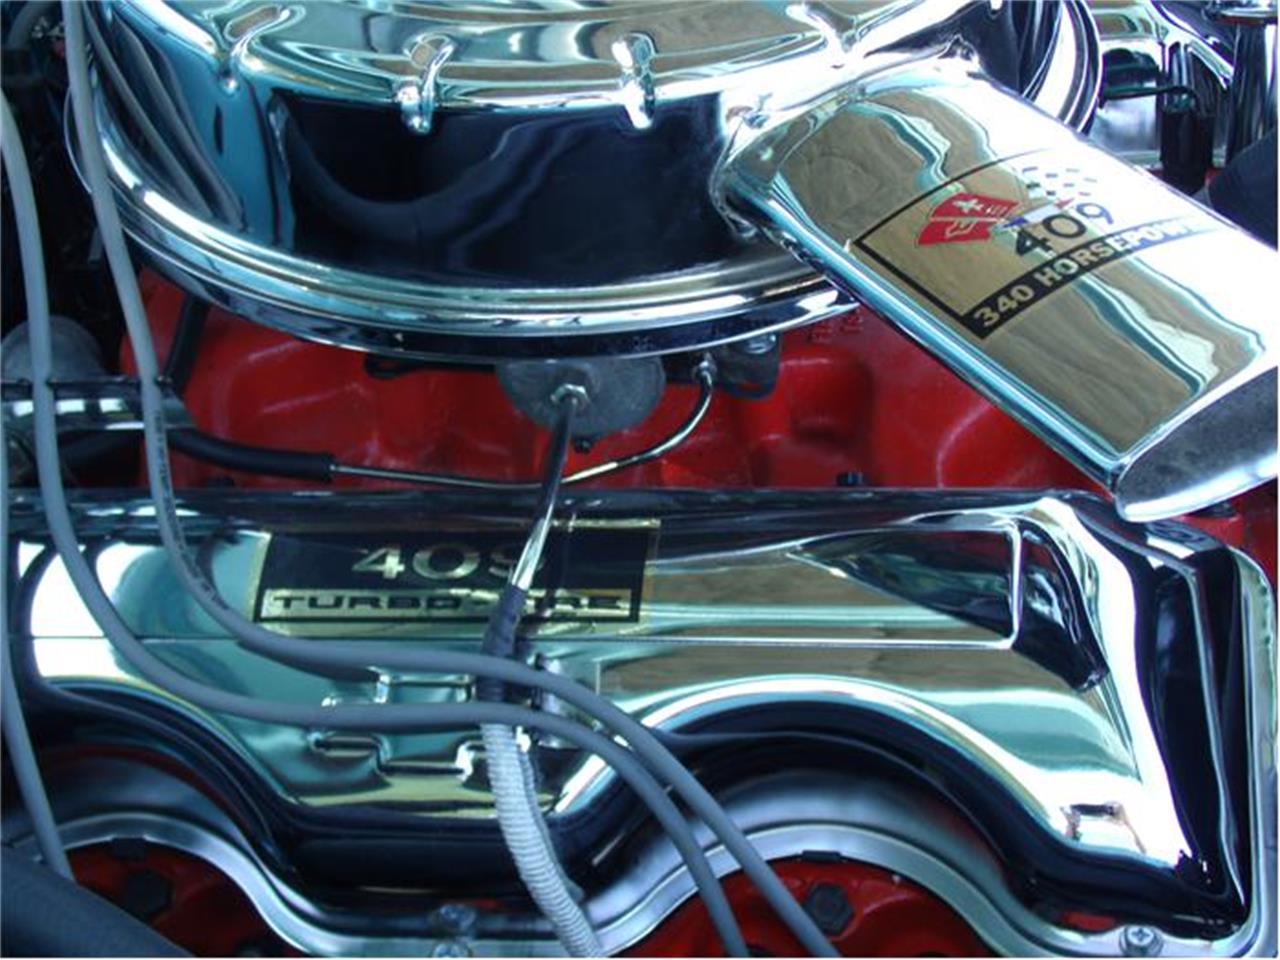 1964 Chevrolet Impala SS (CC-452058) for sale in Quartzsite, Arizona